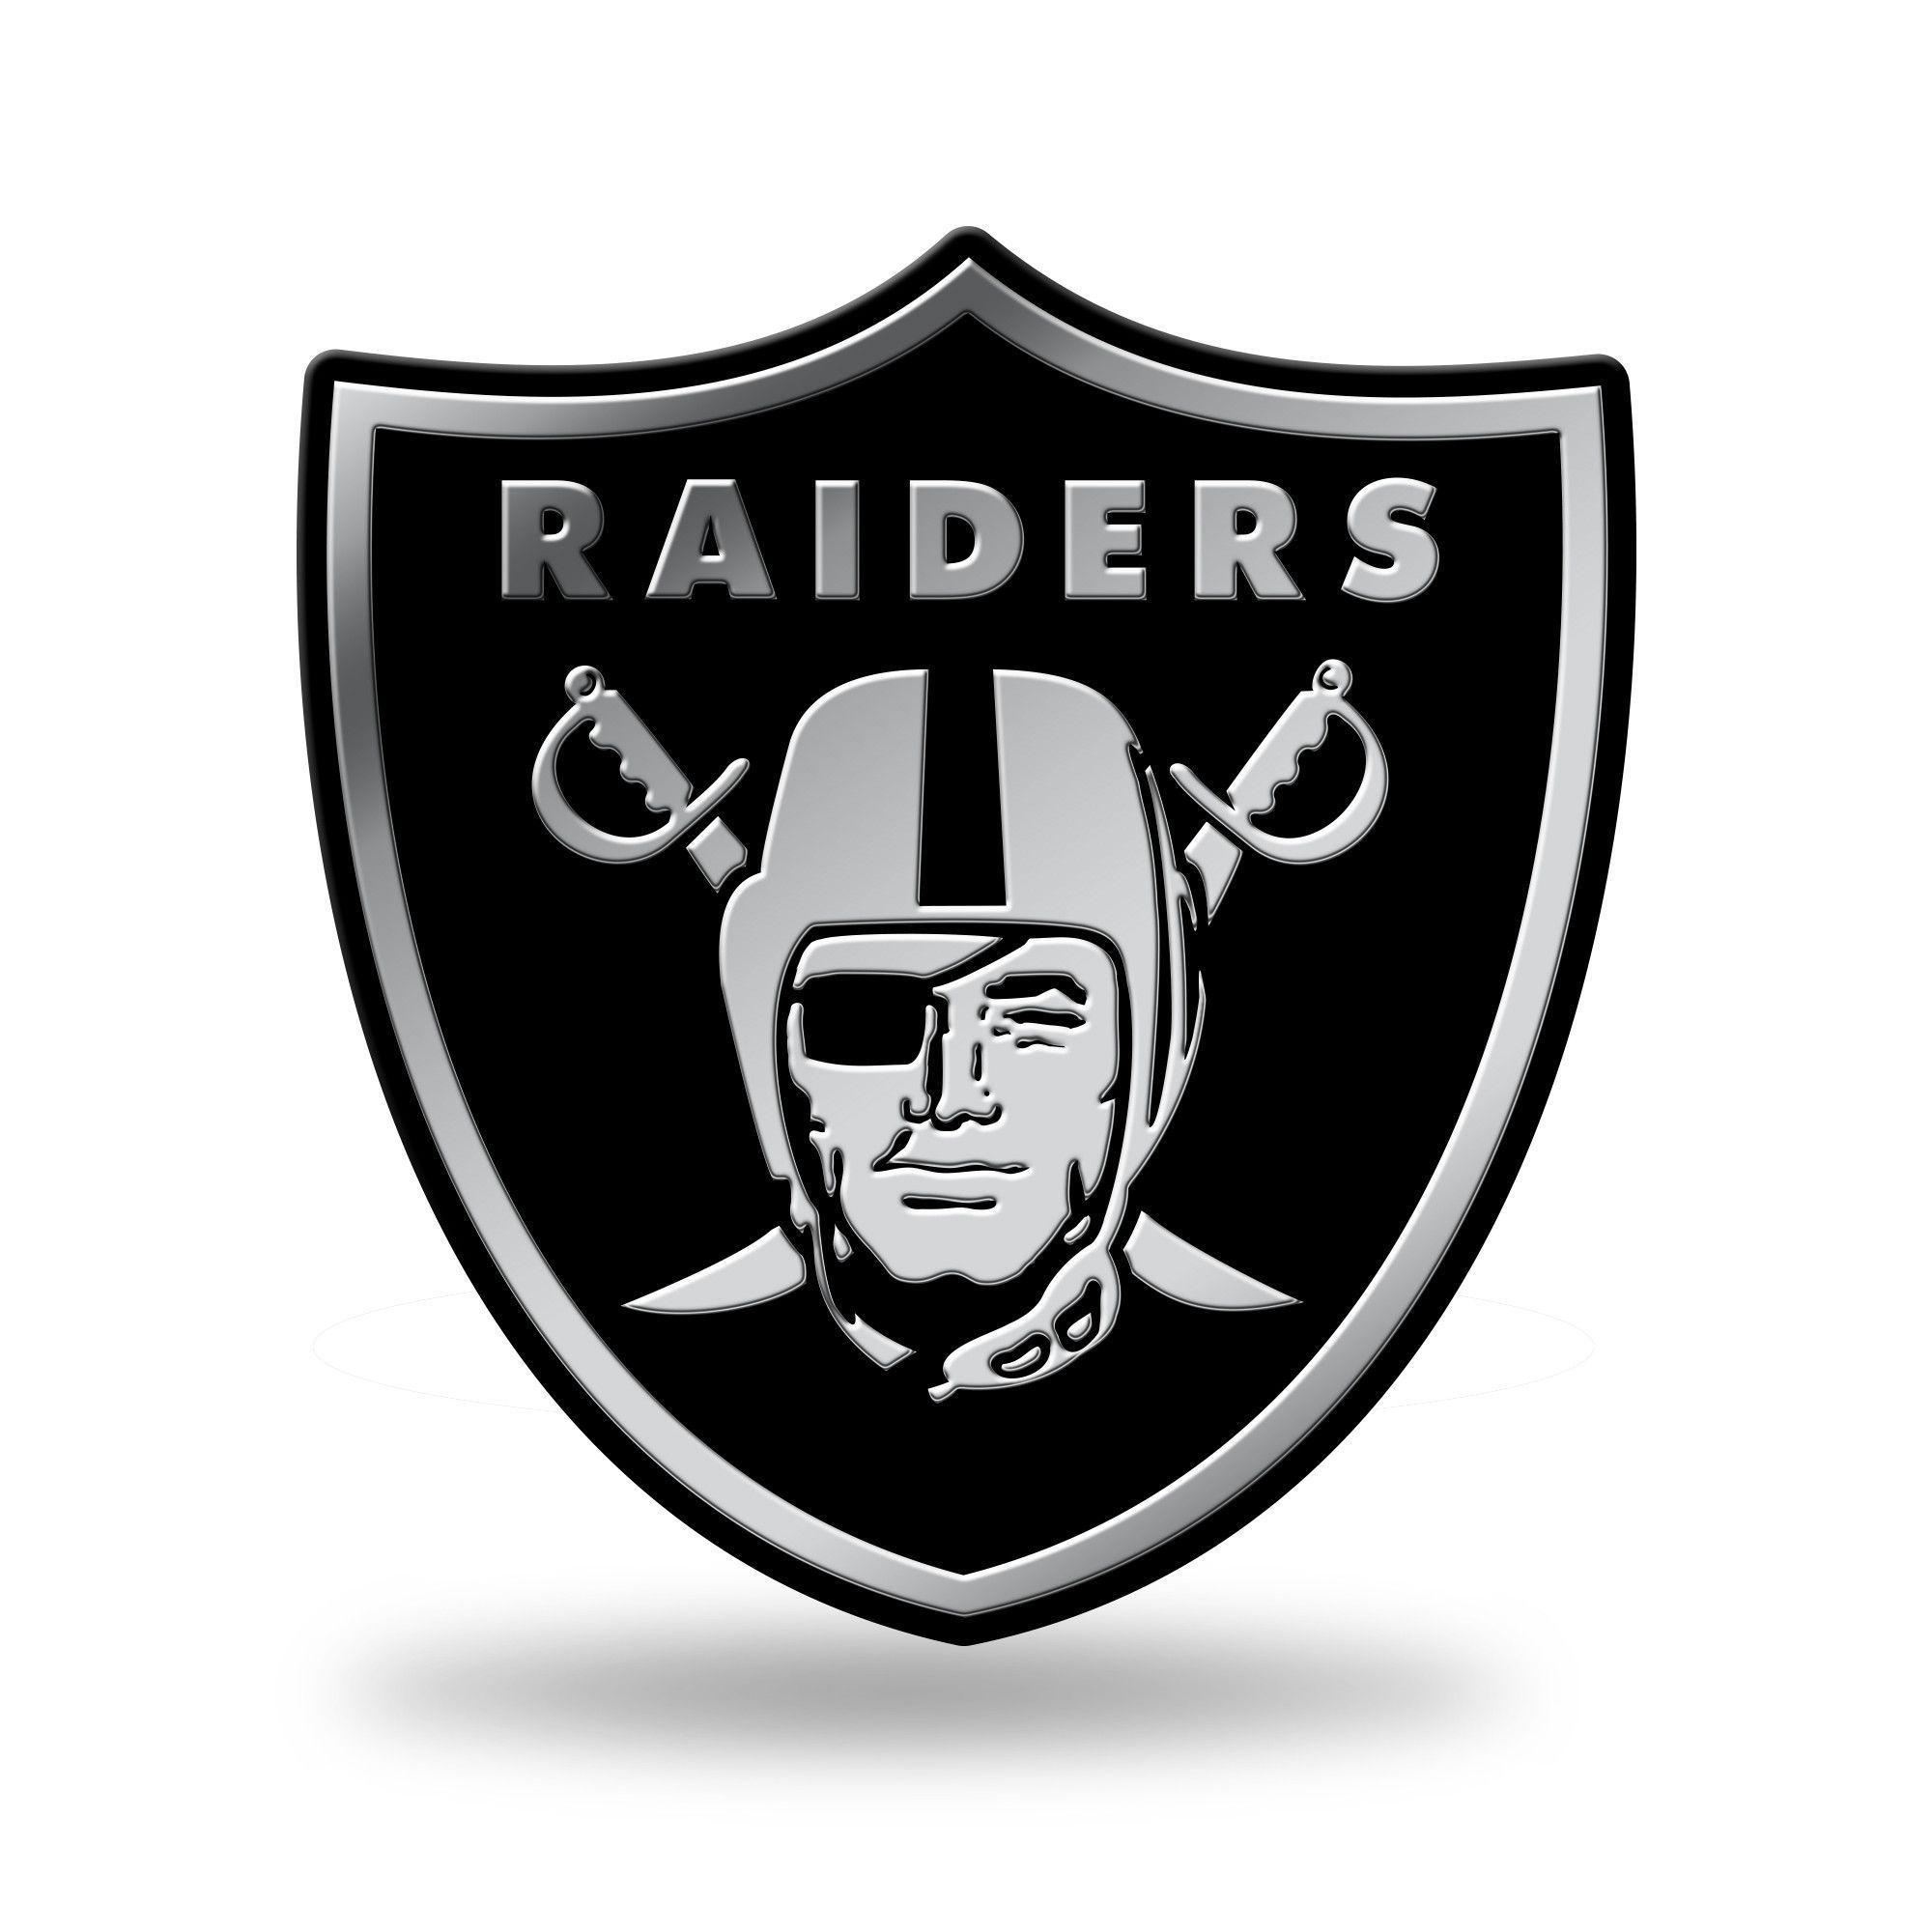 Oakland raiders logo 3d chrome auto emblem new truck or car oakland raiders logo 3d chrome auto emblem new truck or car rico ncaa buycottarizona